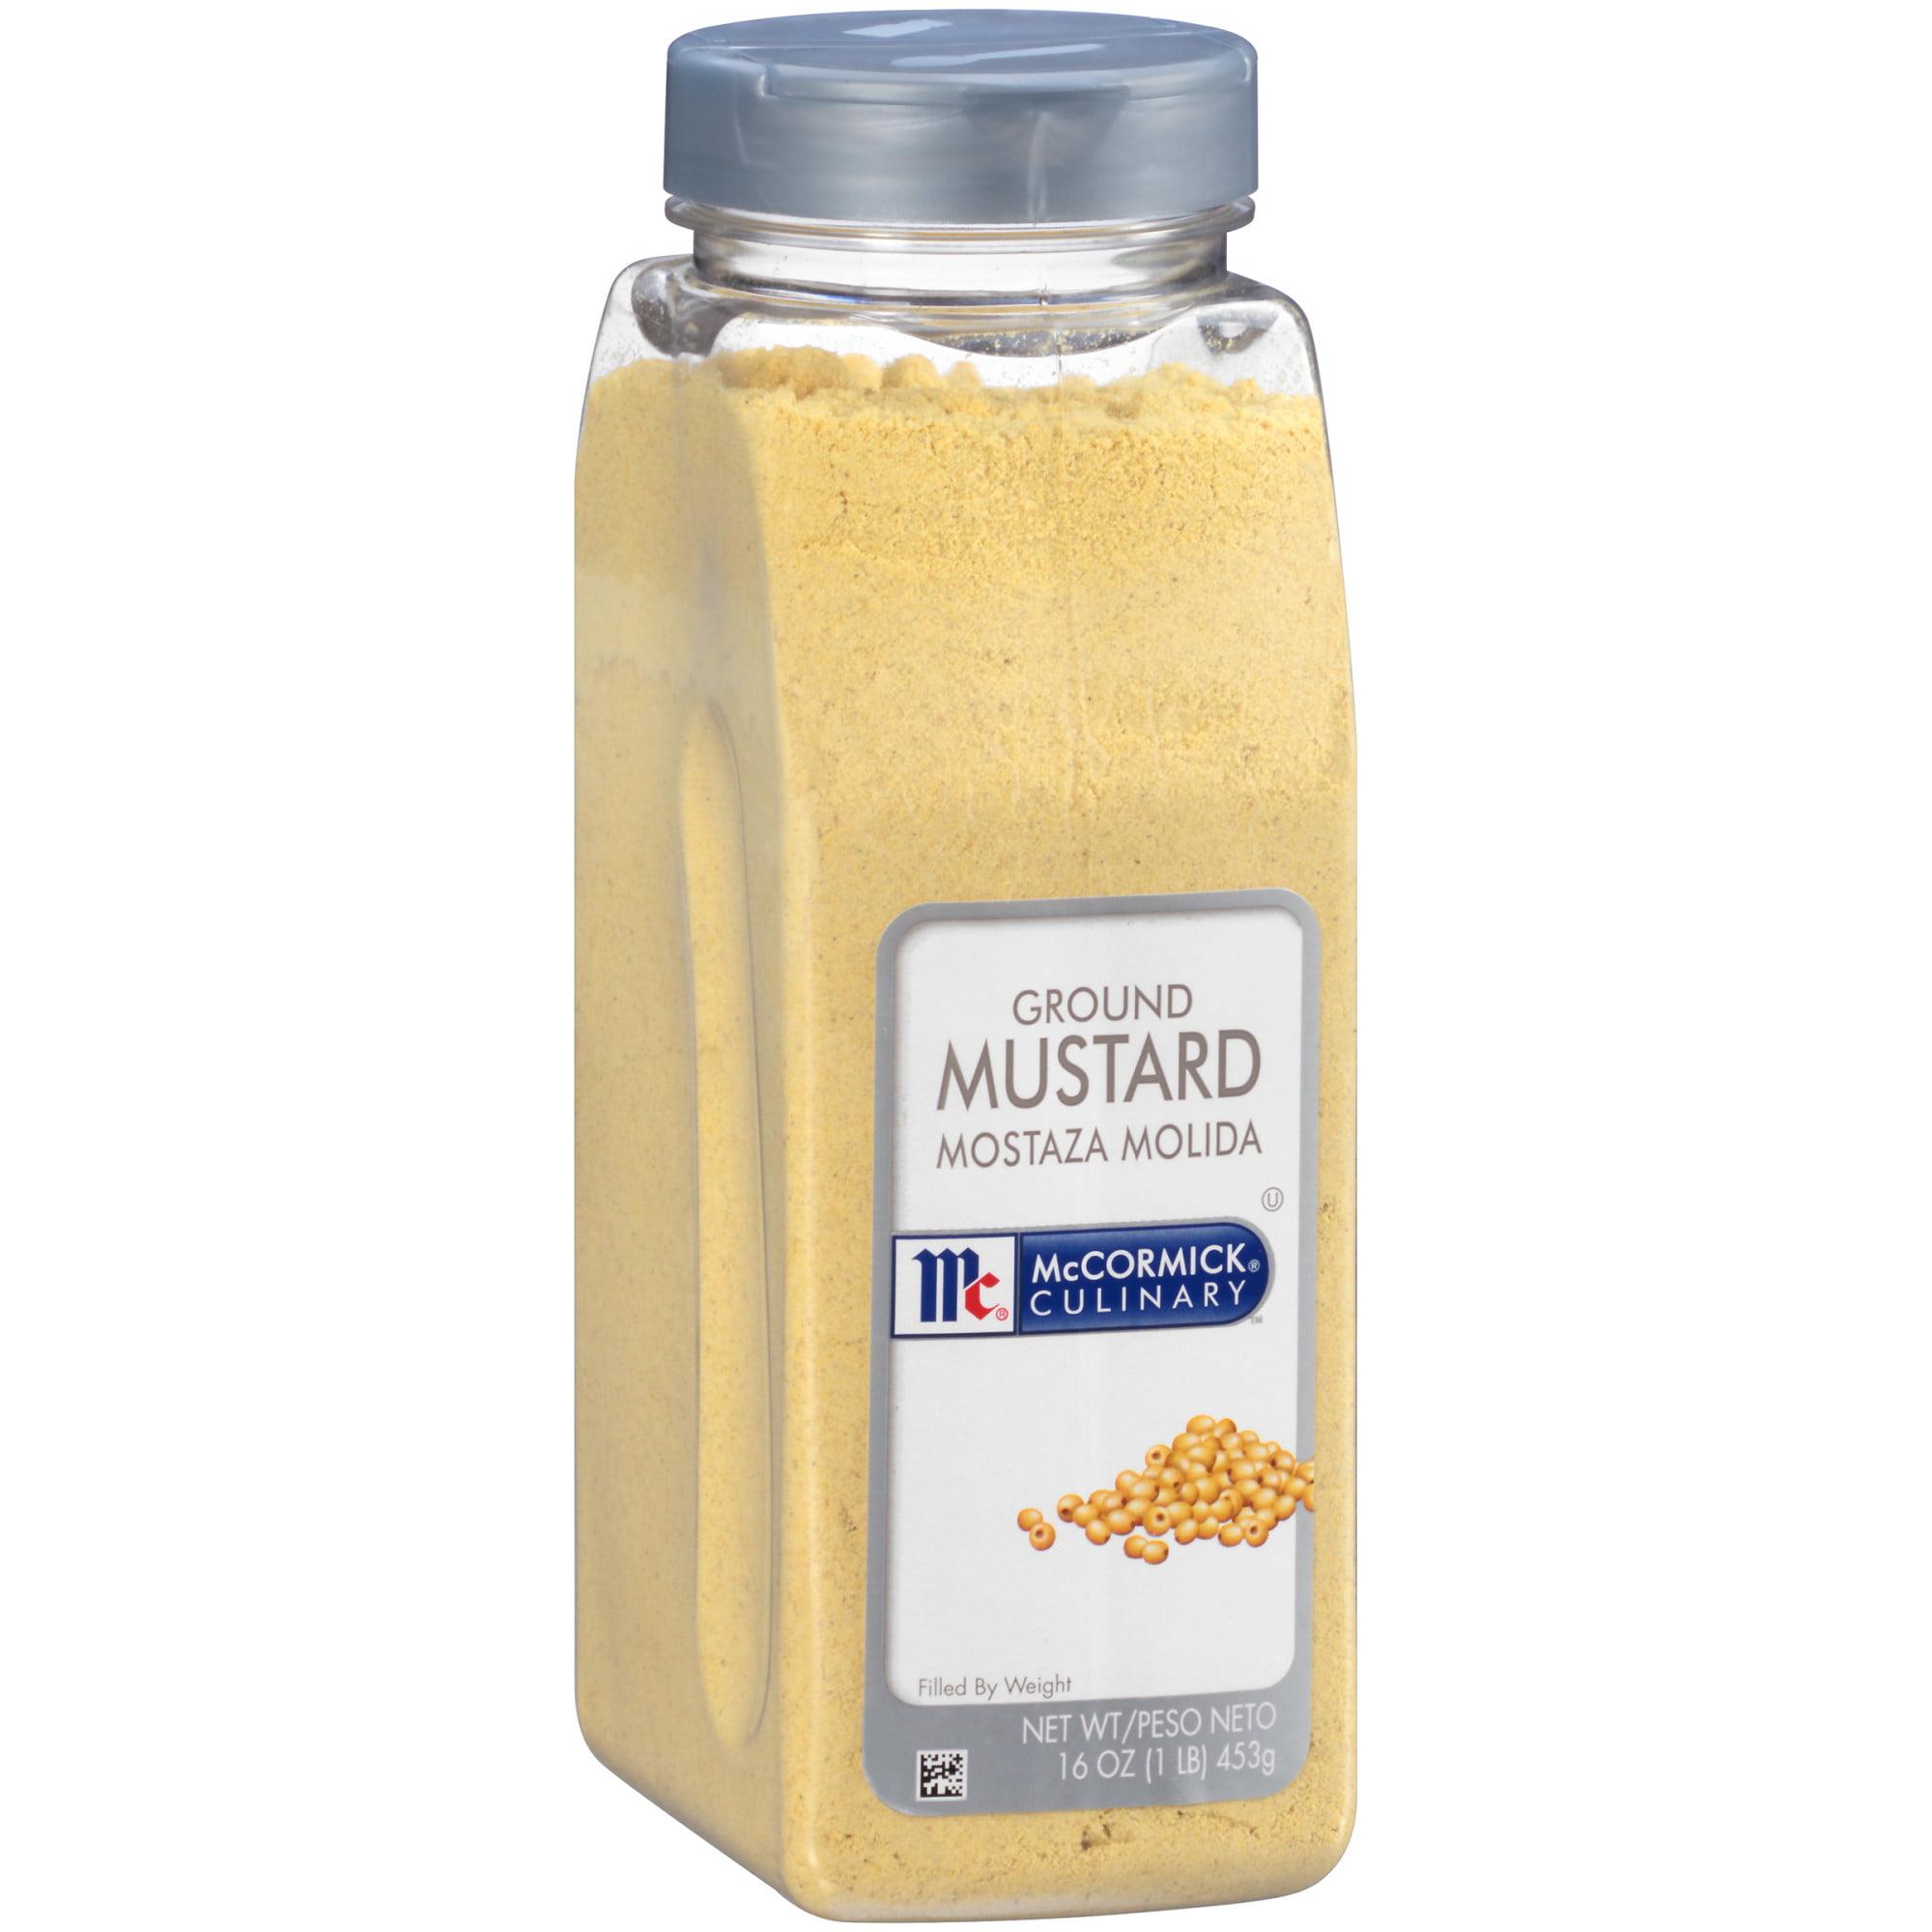 McCormick Culinary Ground Mustard, 1 lb